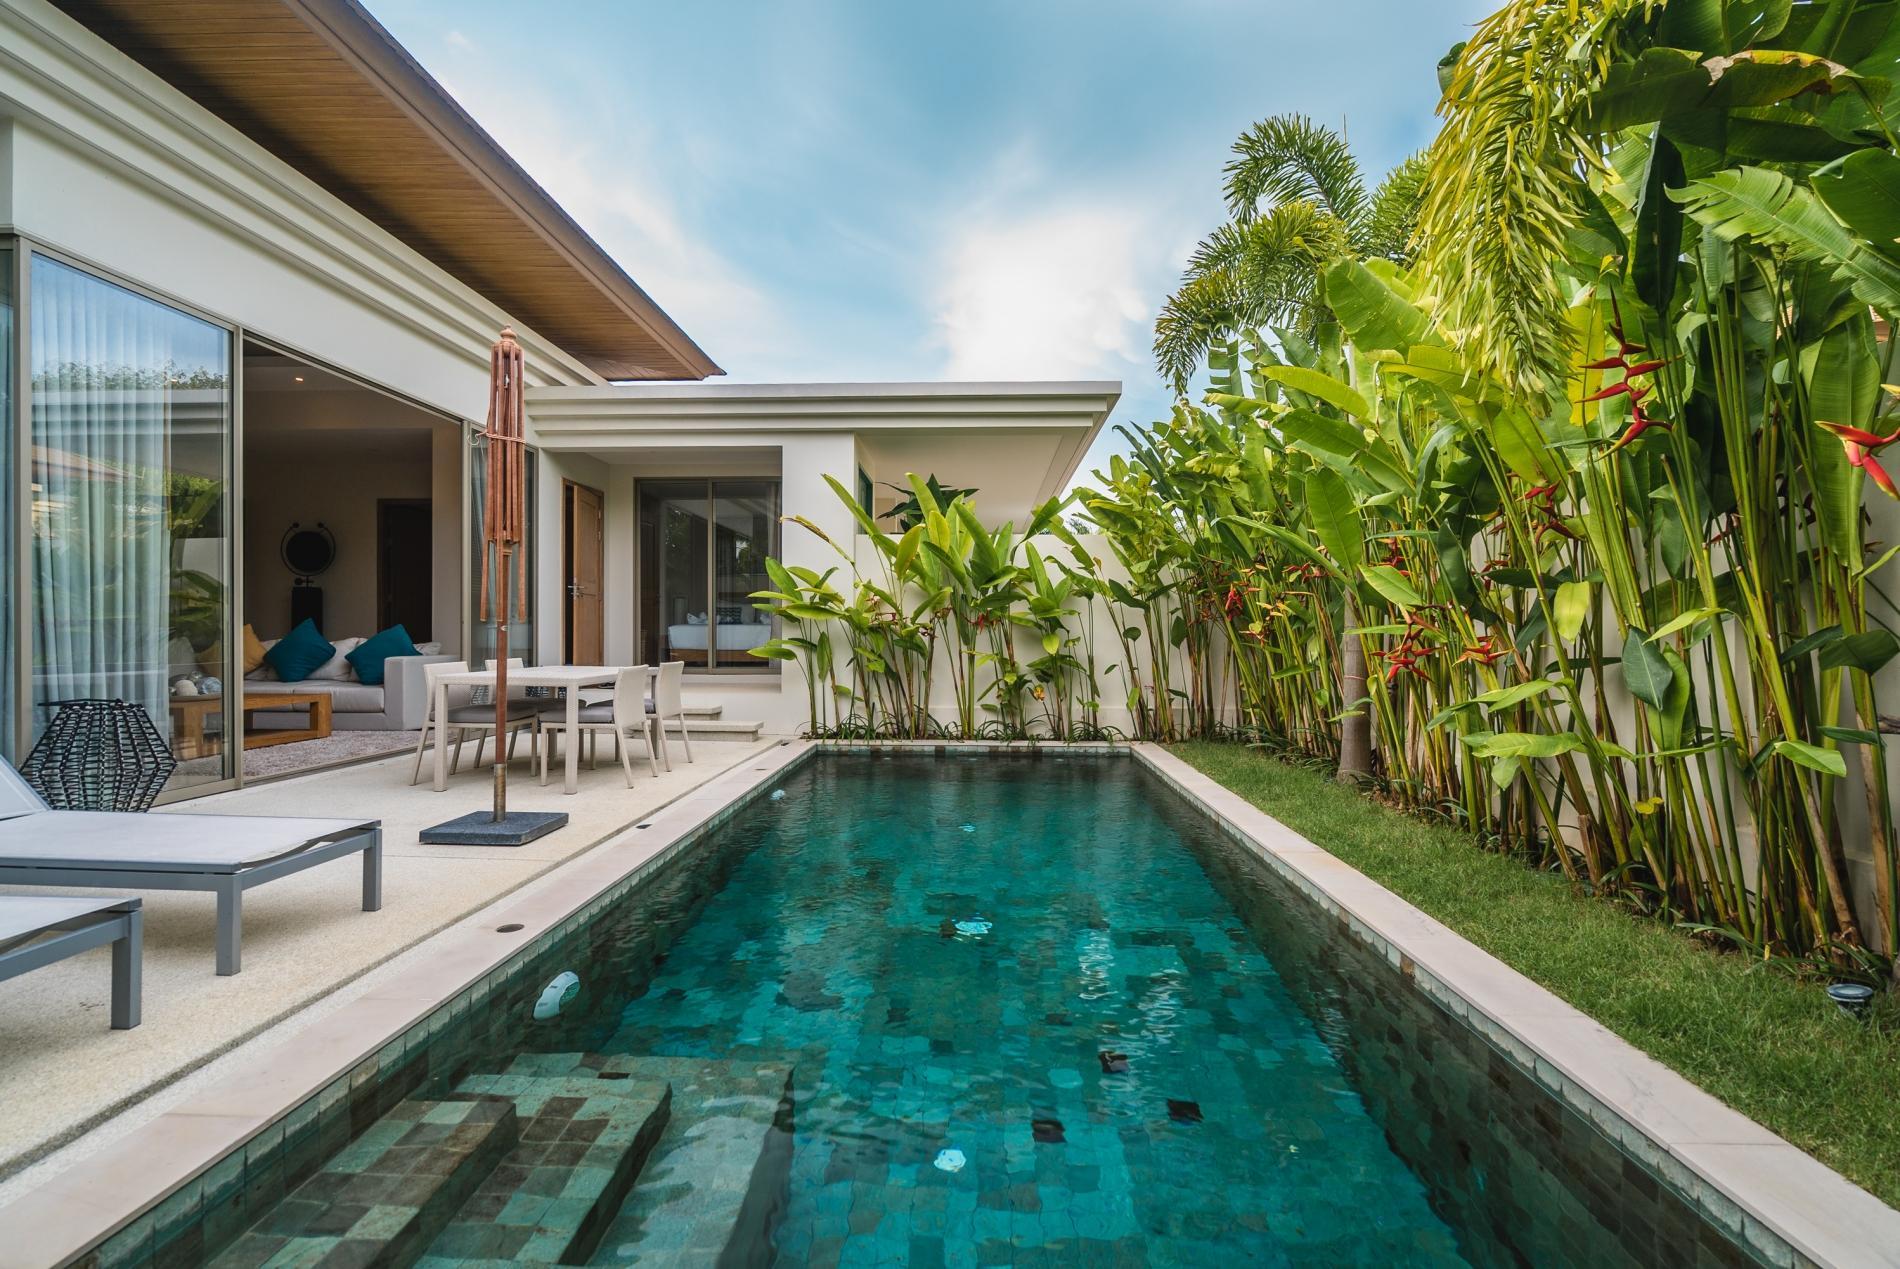 Apartment Trichada 18 - Private pool modern 3 bedroom villa photo 18131728